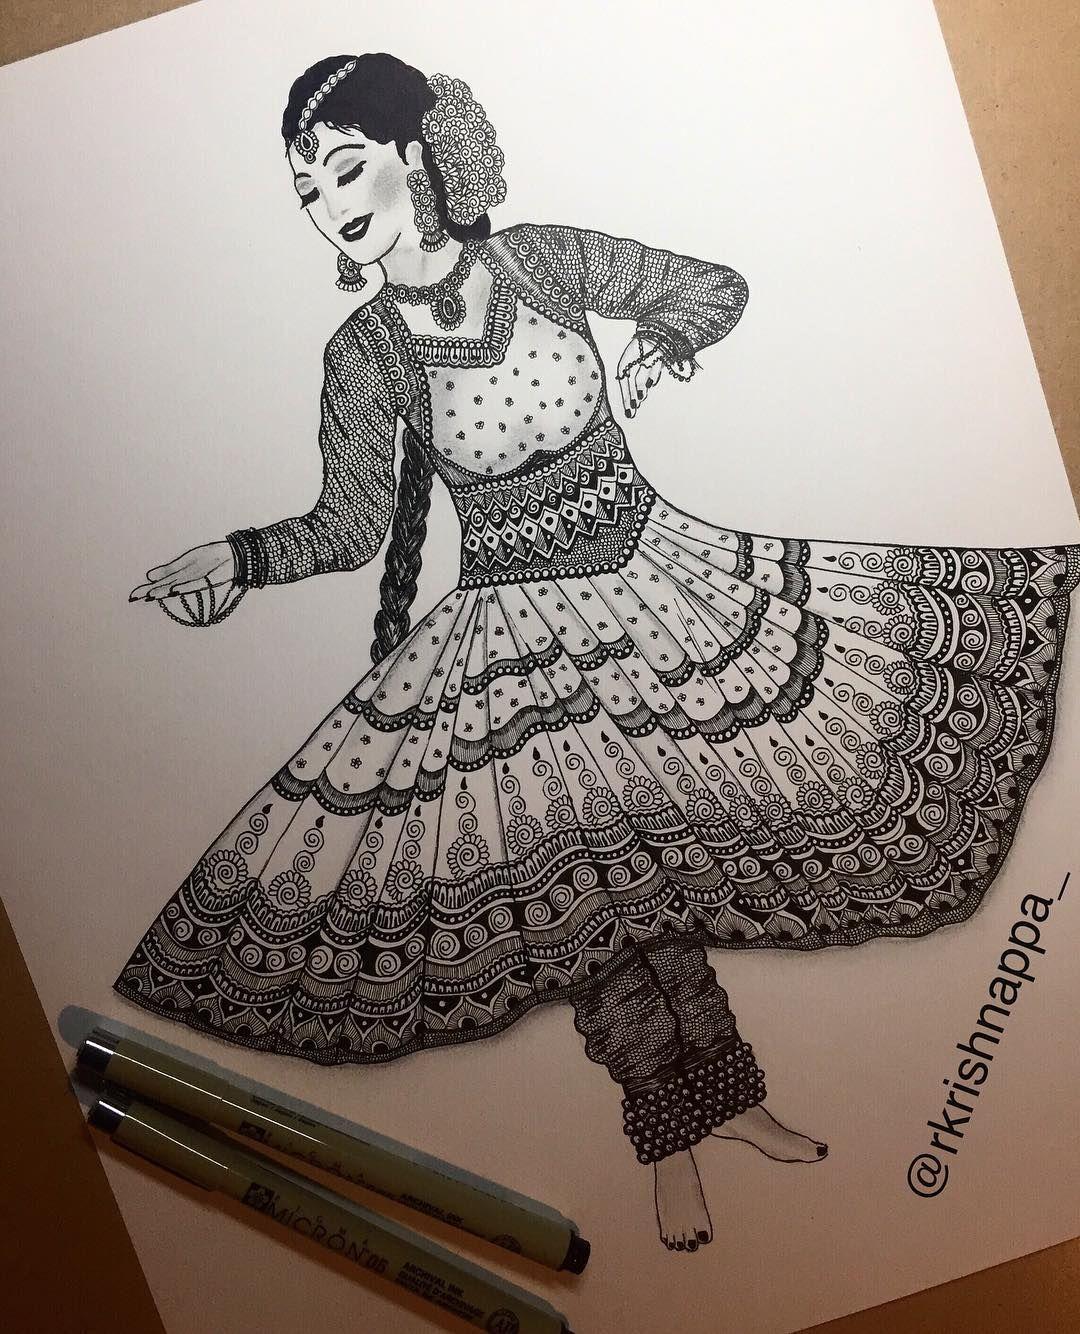 Pin By Divyanshi Singh On Mandala Design Art In 2020 Dancing Drawings Mandala Design Art Art